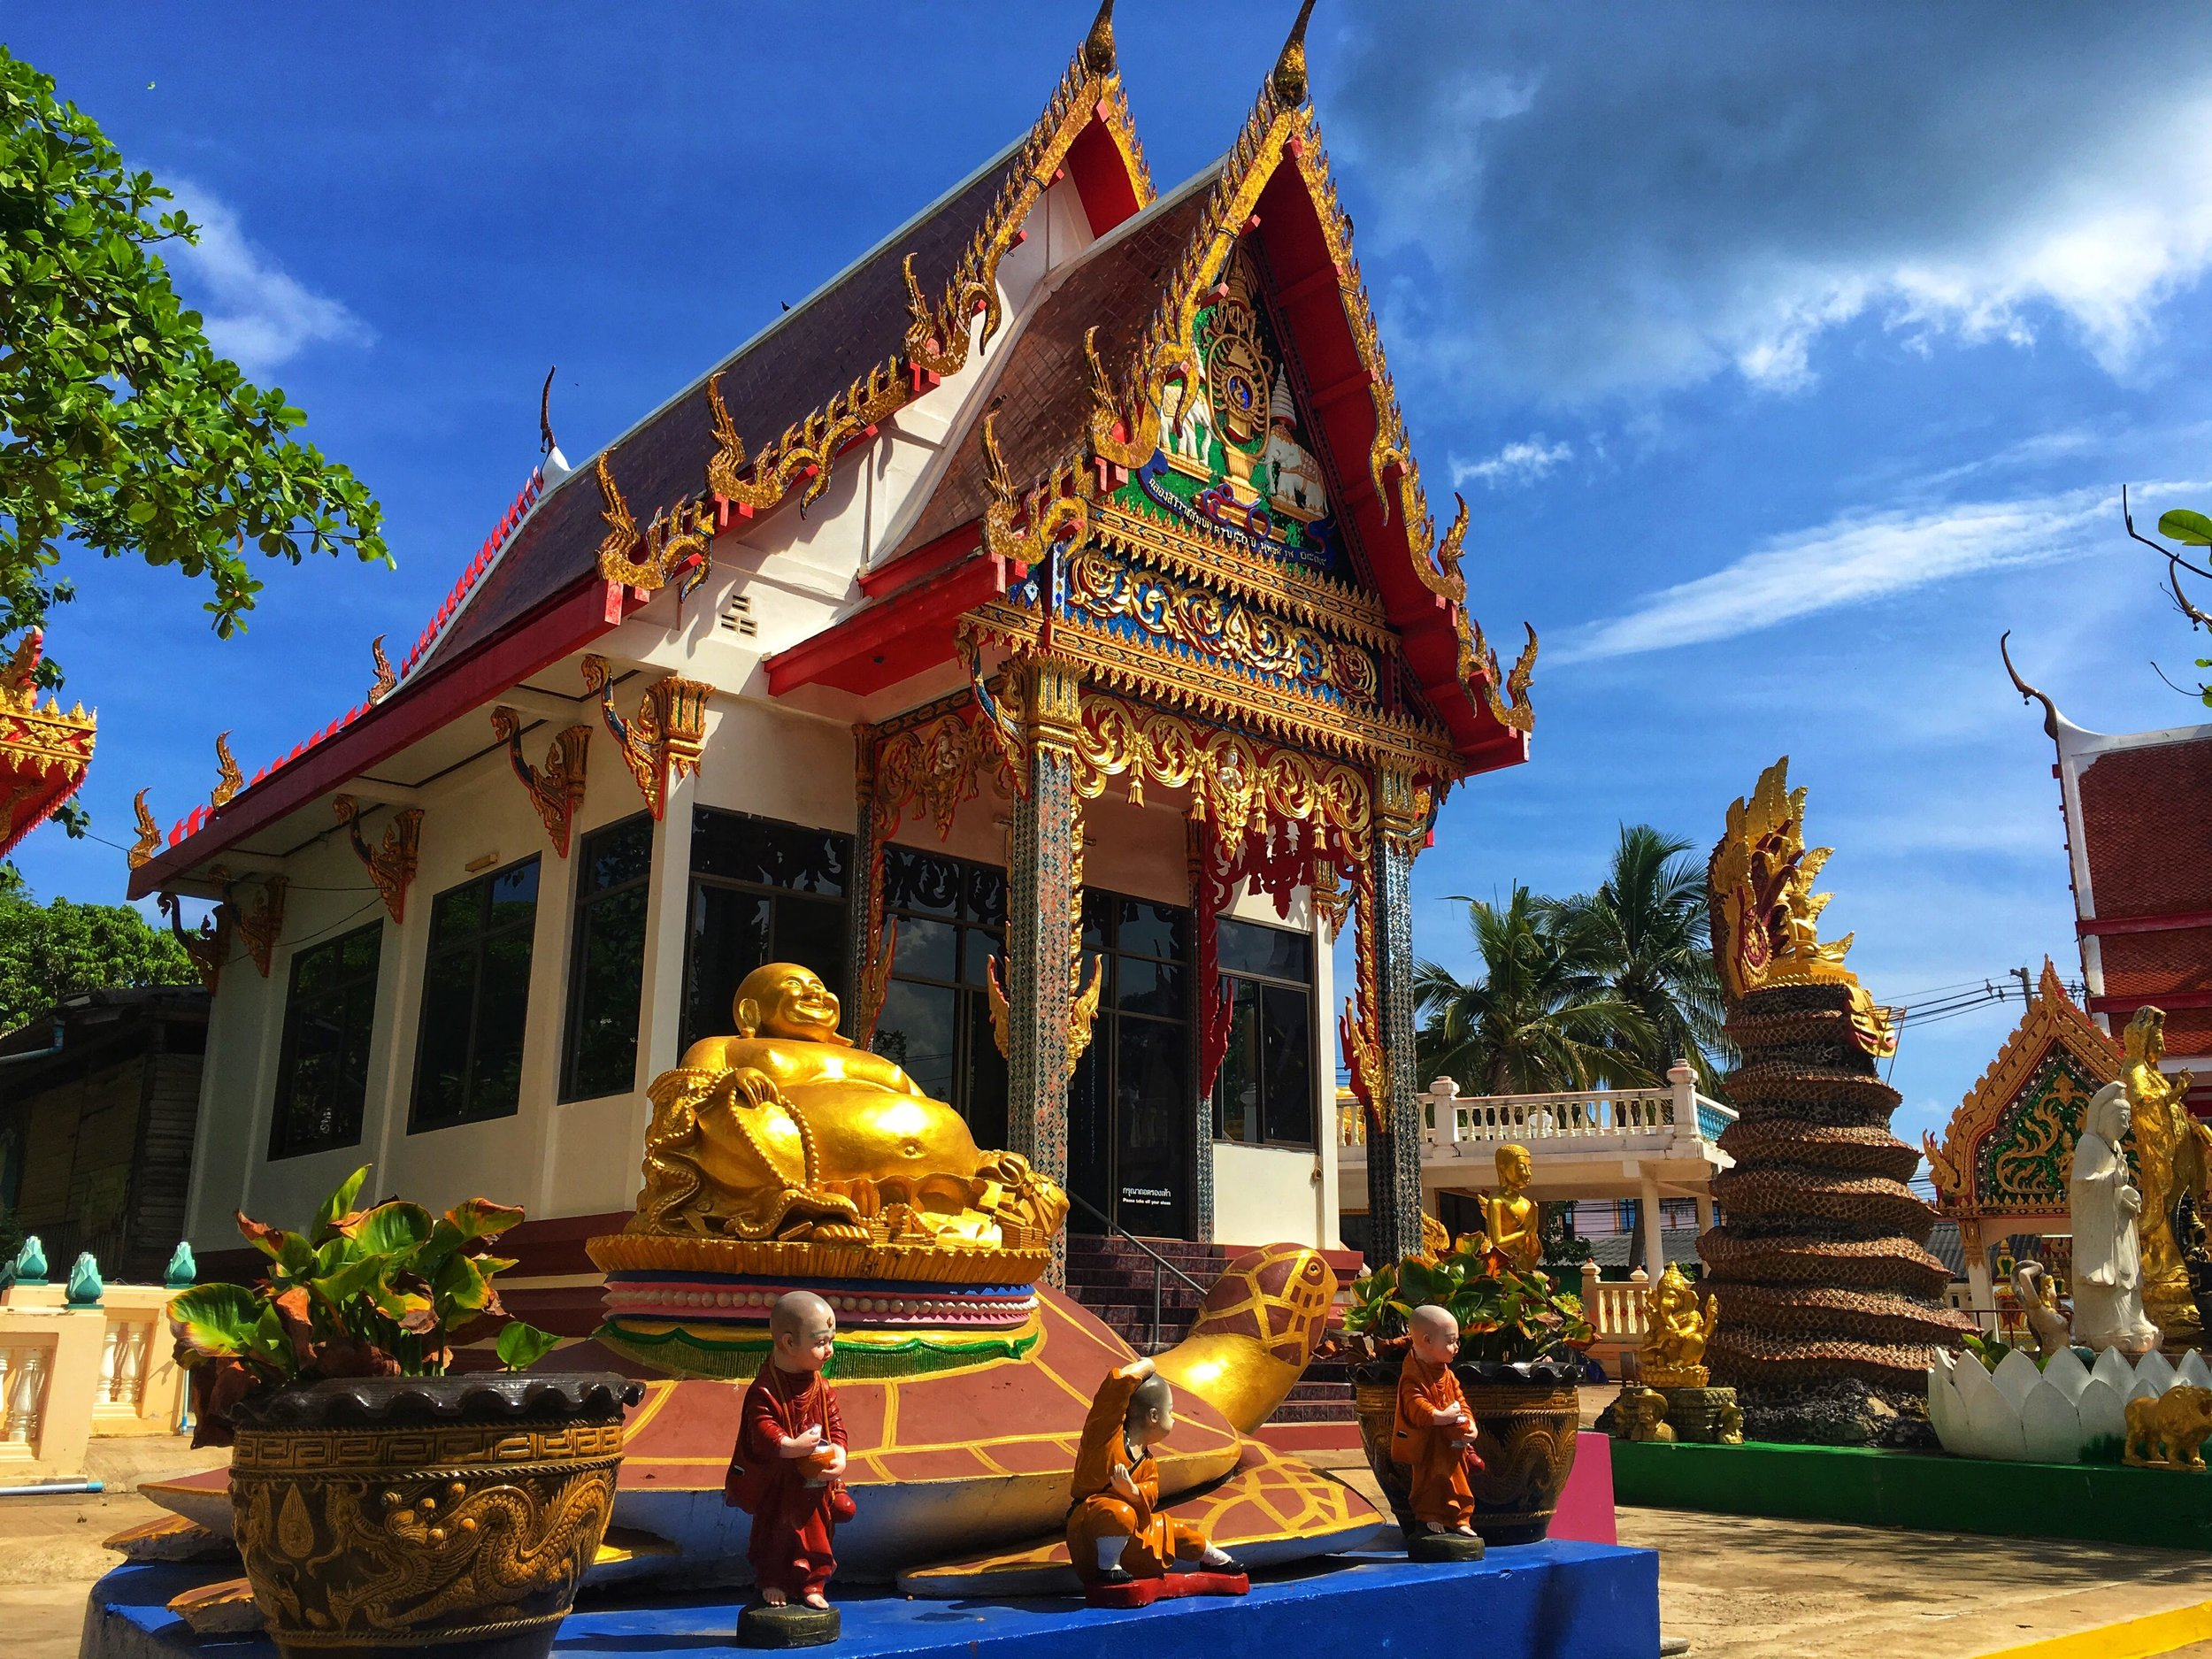 Wat Koh Larn, on Koh Larn Island, just off the coast of Pattaya, Thailand